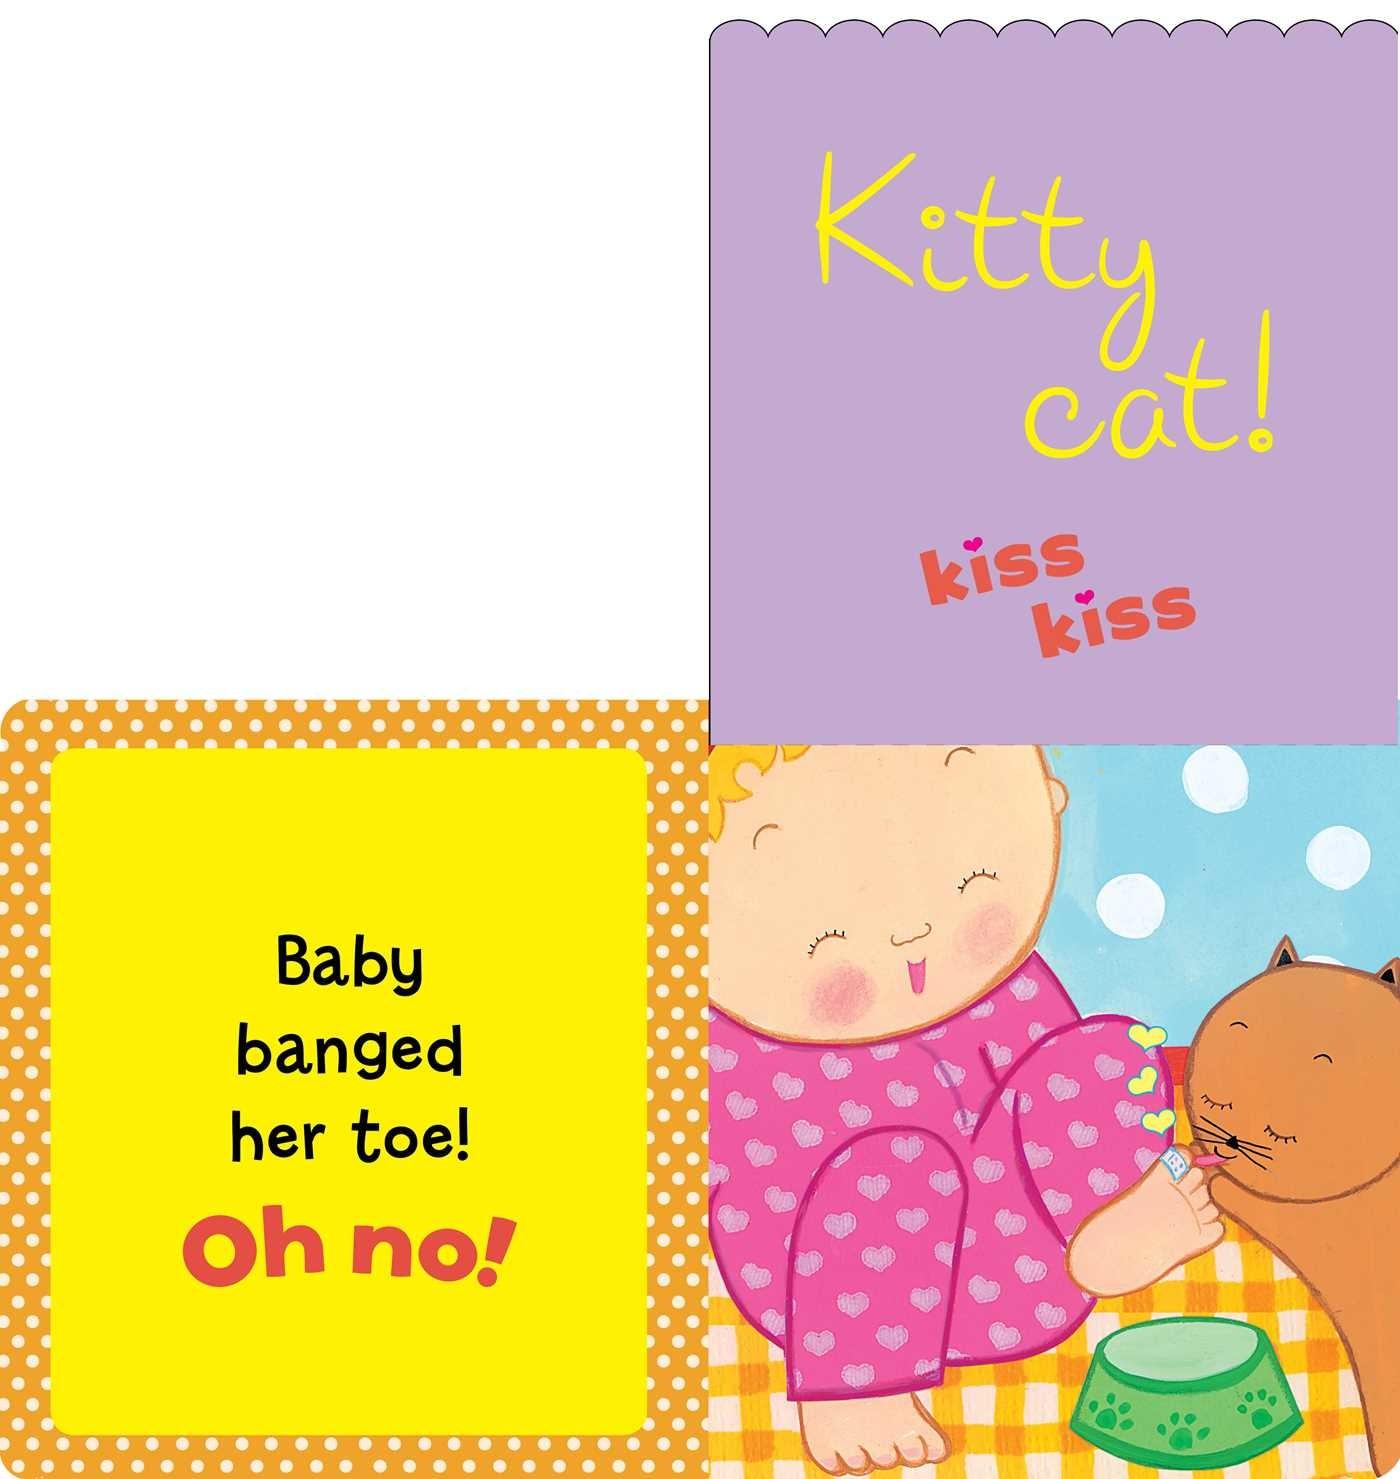 Kiss babys boo boo 9781481442084.in04